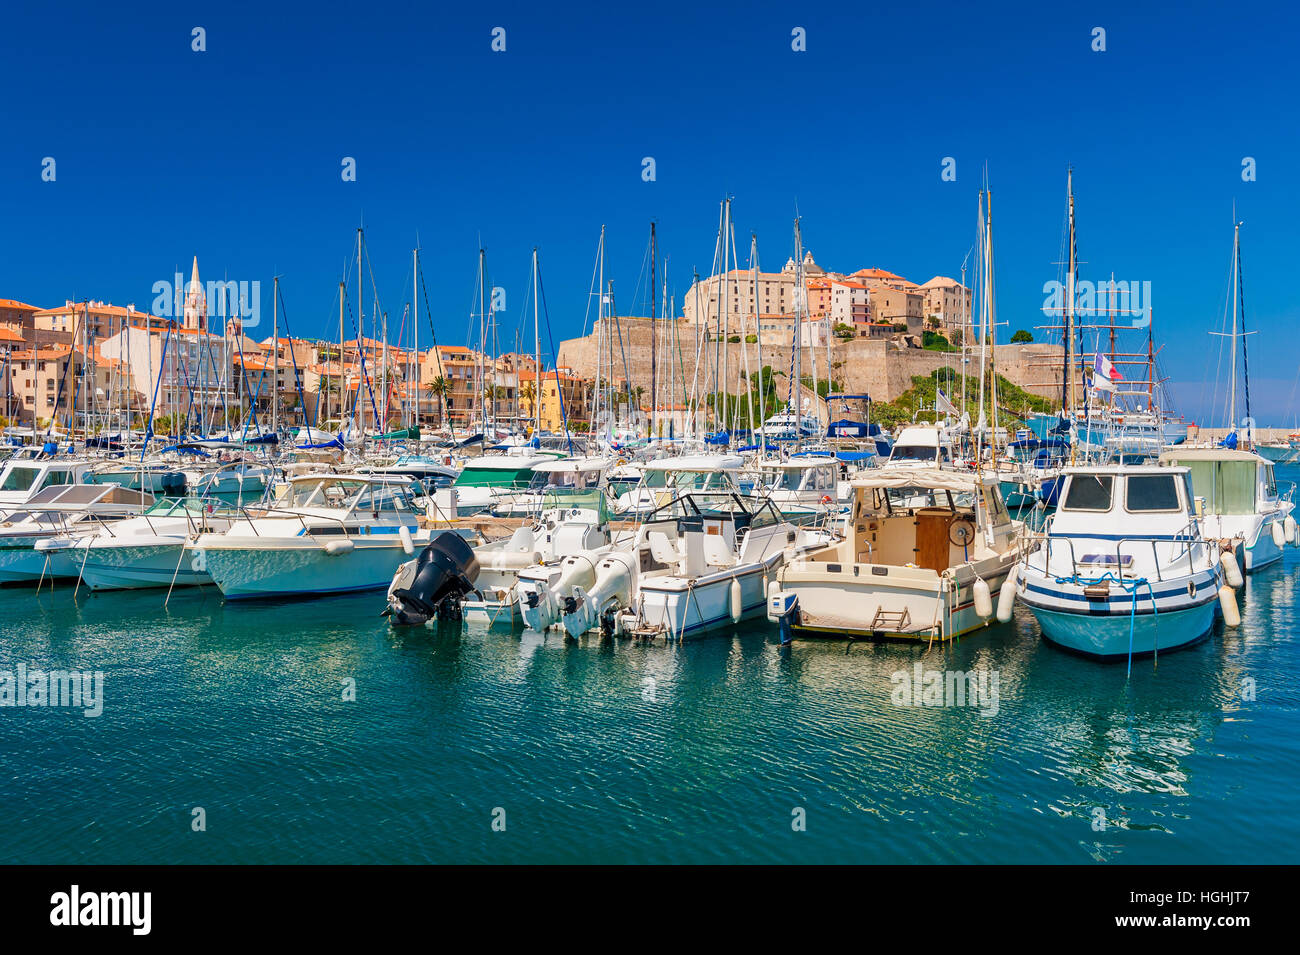 Marina of Calvi Corsica - Stock Image